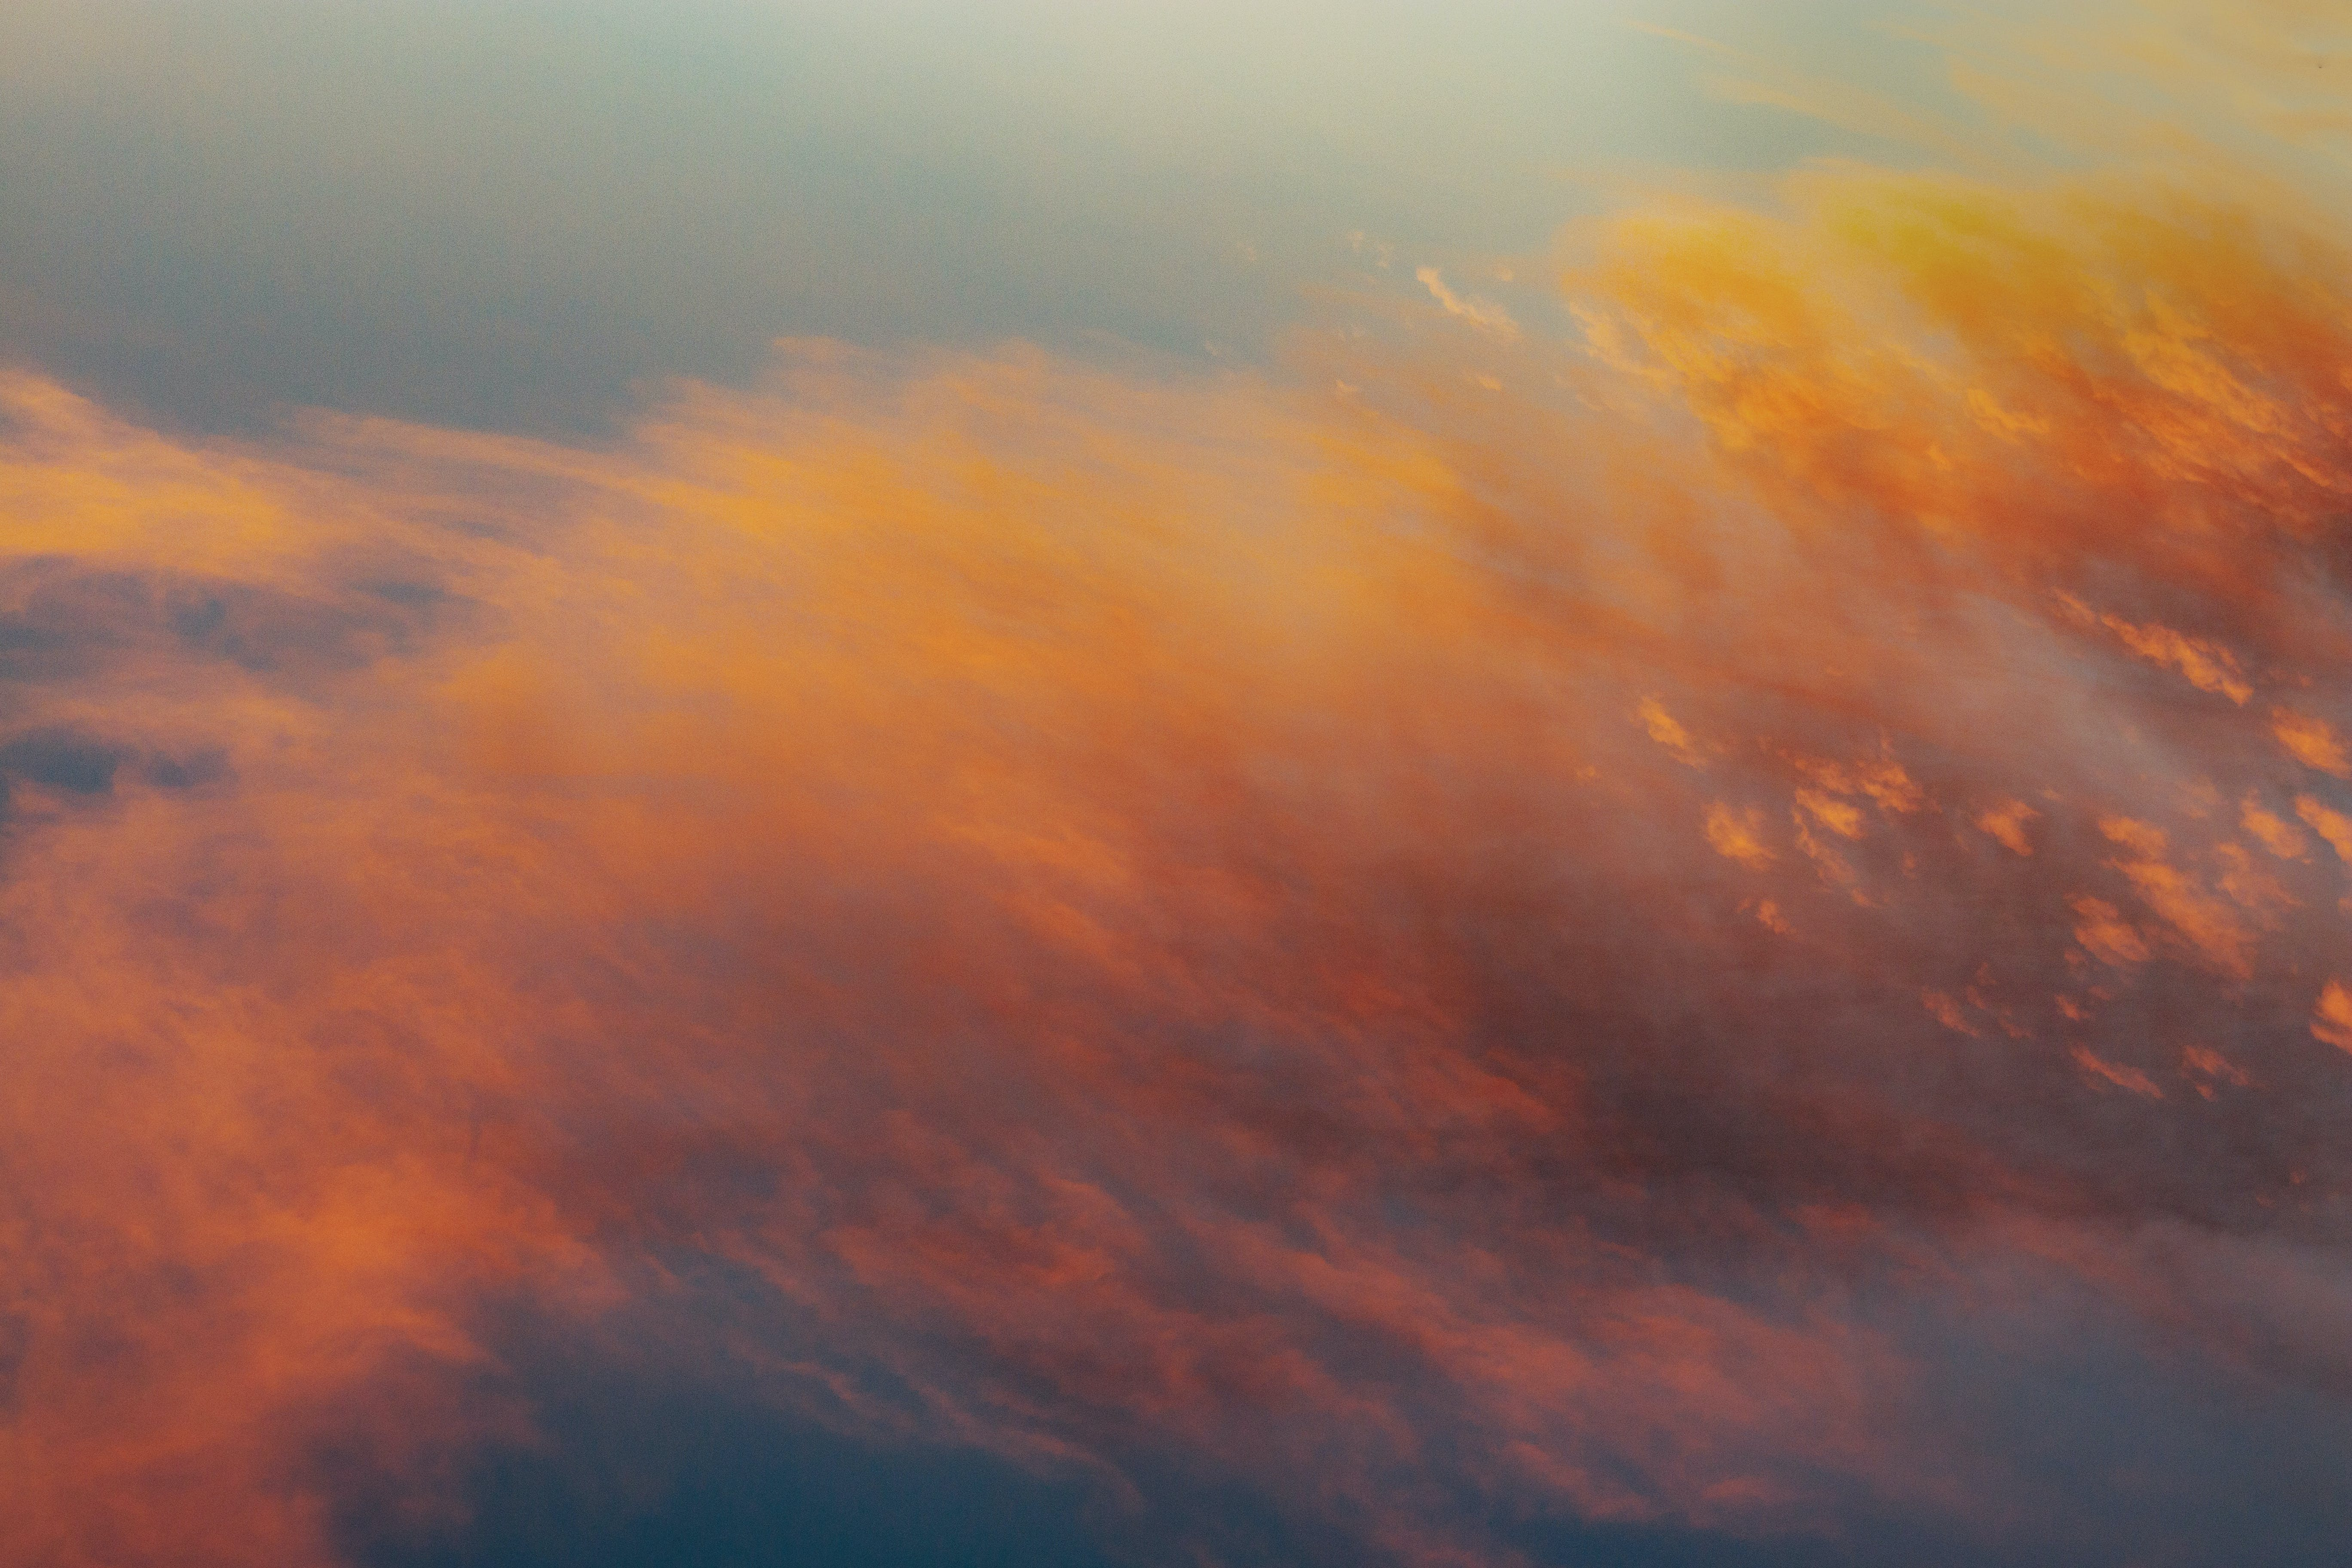 Kostenloses Stock Foto zu 4k wallpaper, atmosphäre, dämmerung, himmel